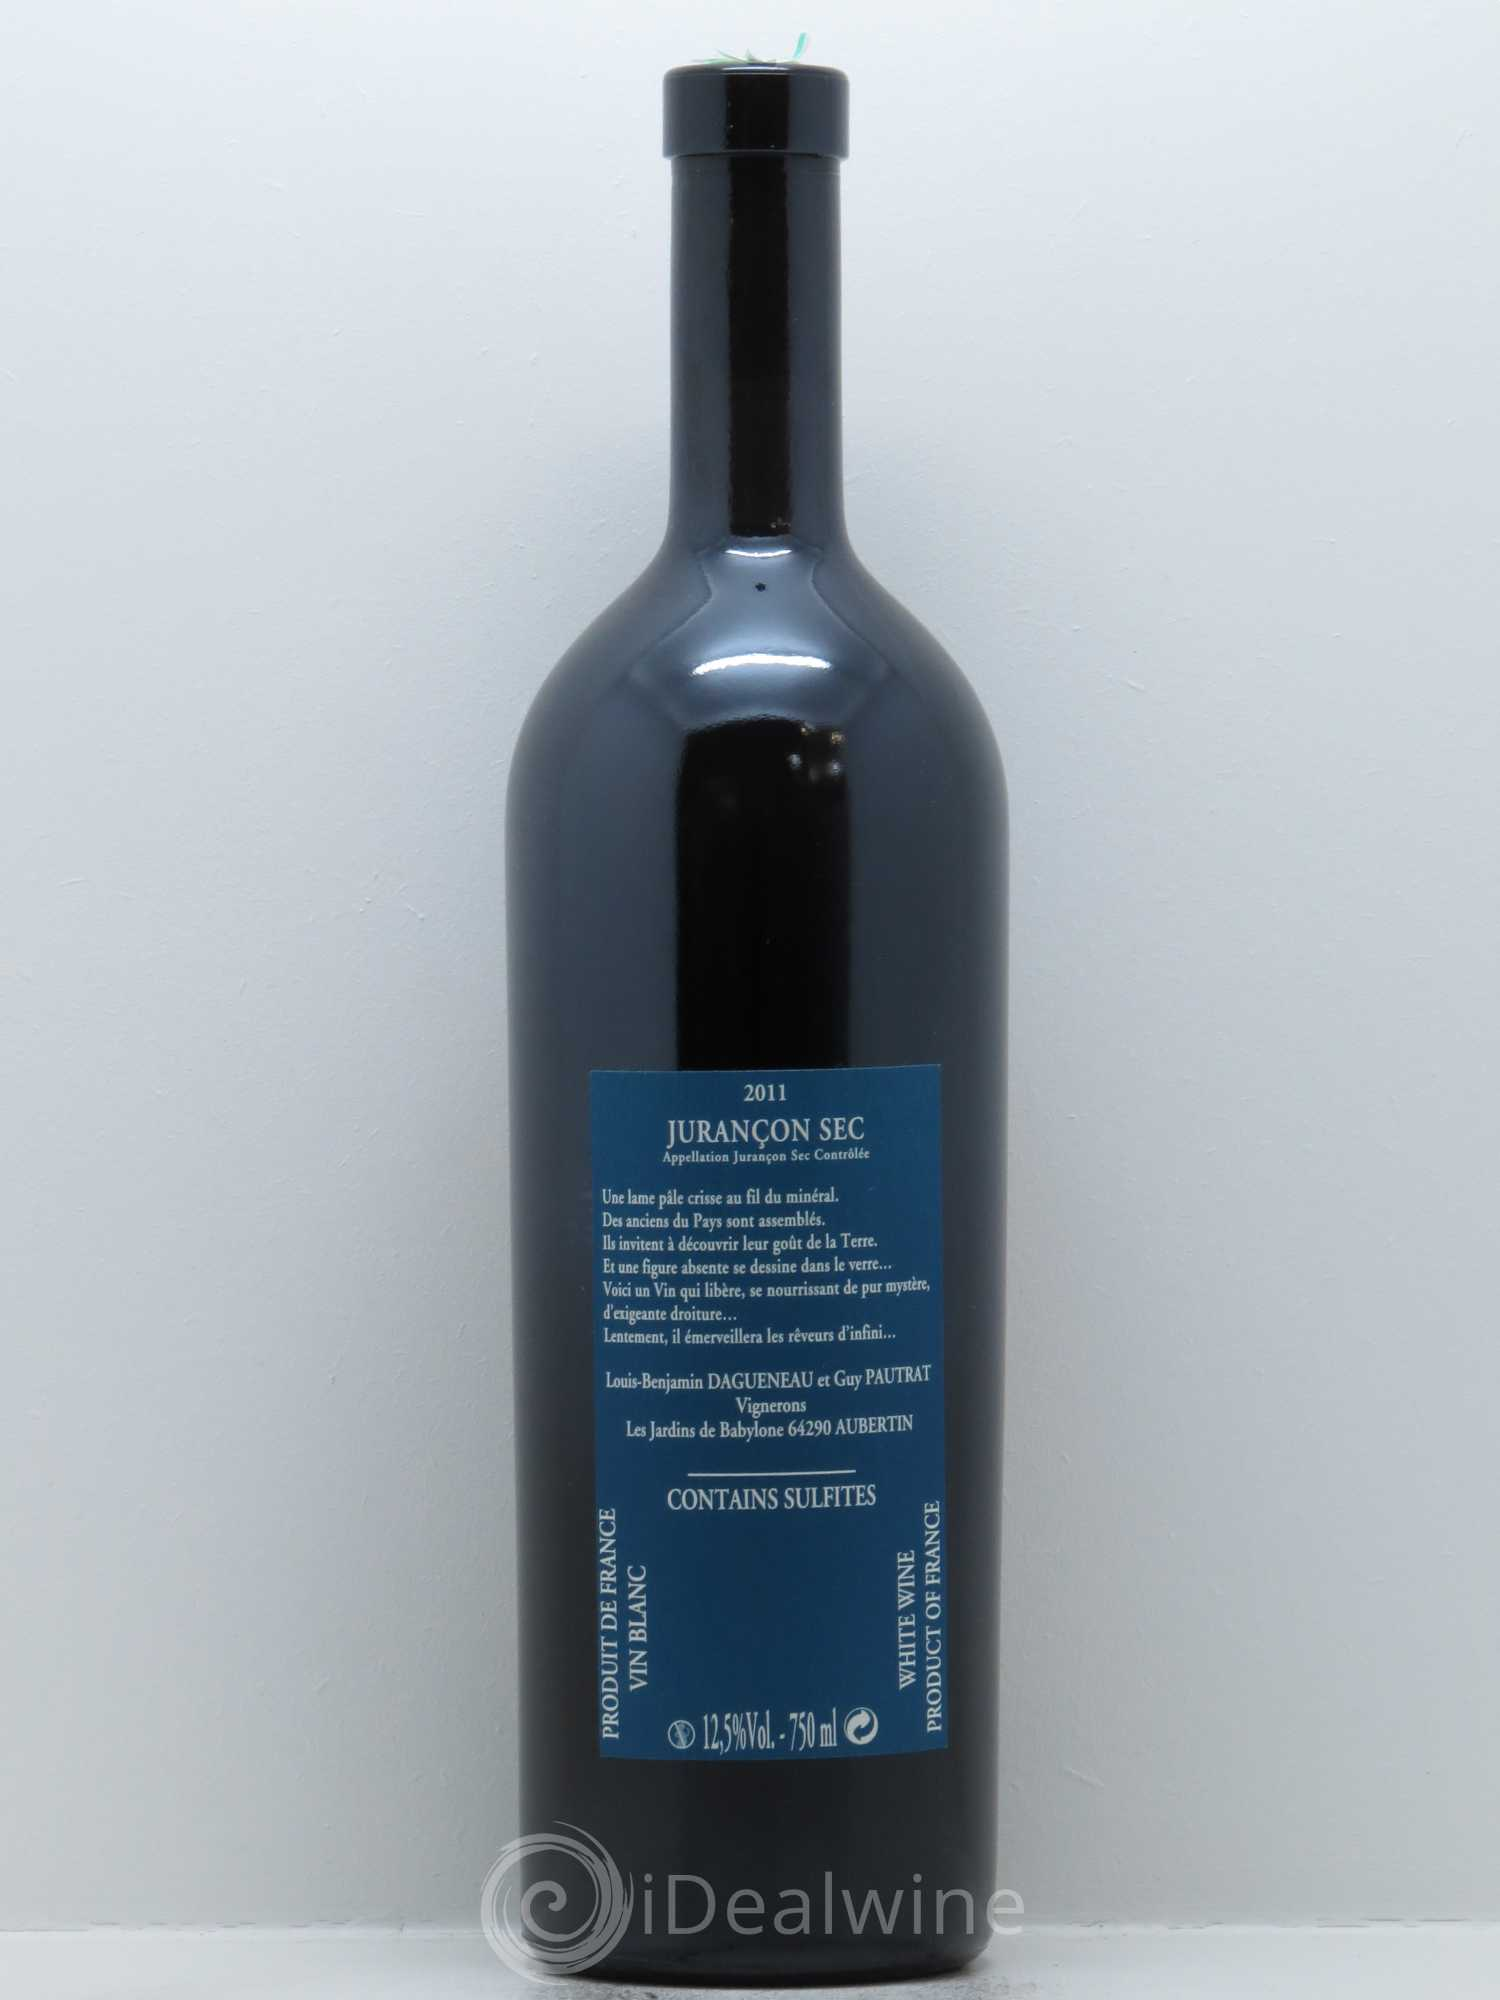 Acheter juran on sec les jardins de babylone didier for Jardin de babylone wine